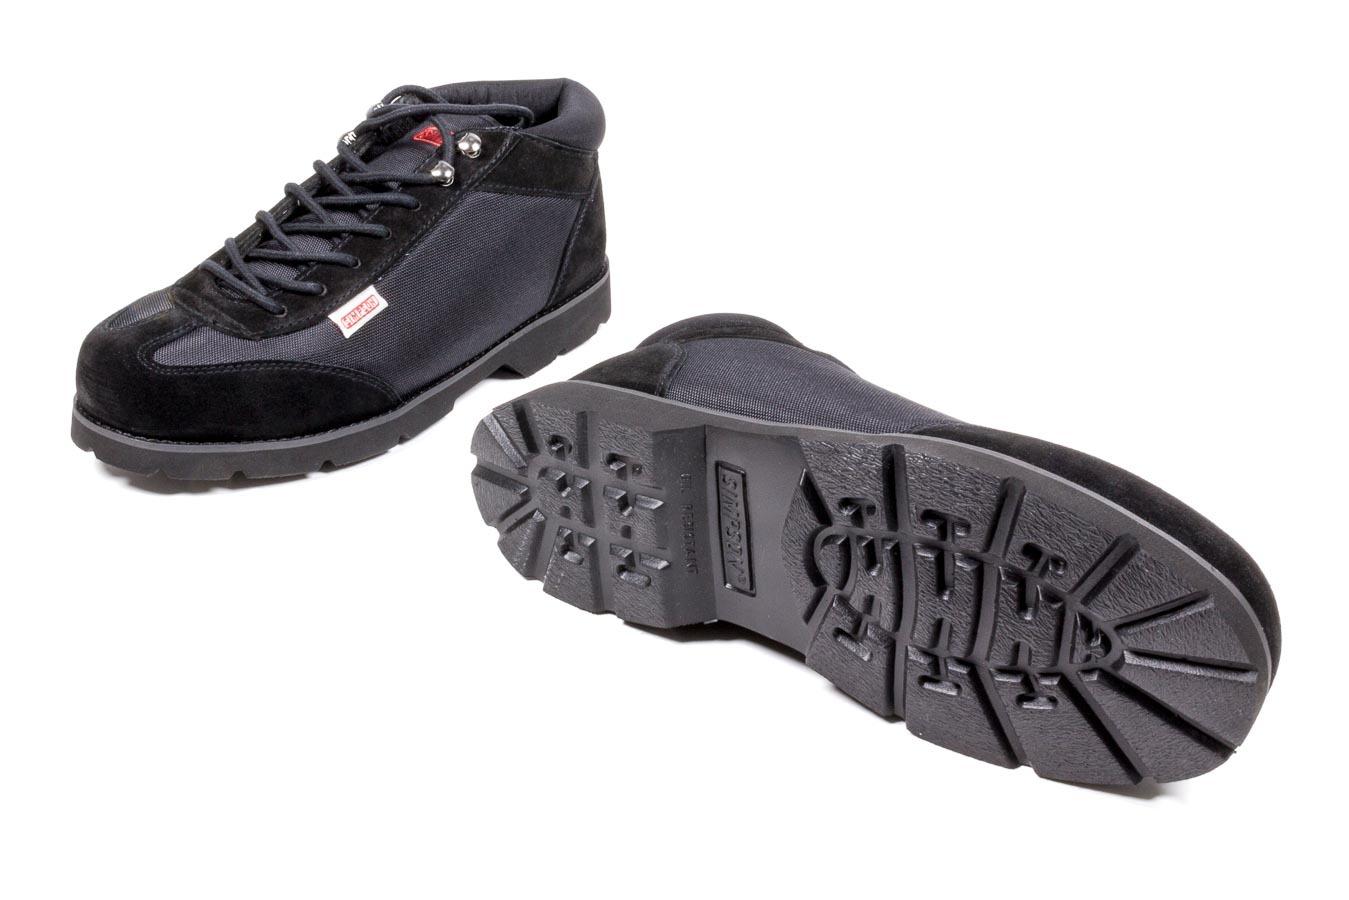 Simpson Safety Crew Shoe Size 7 Black